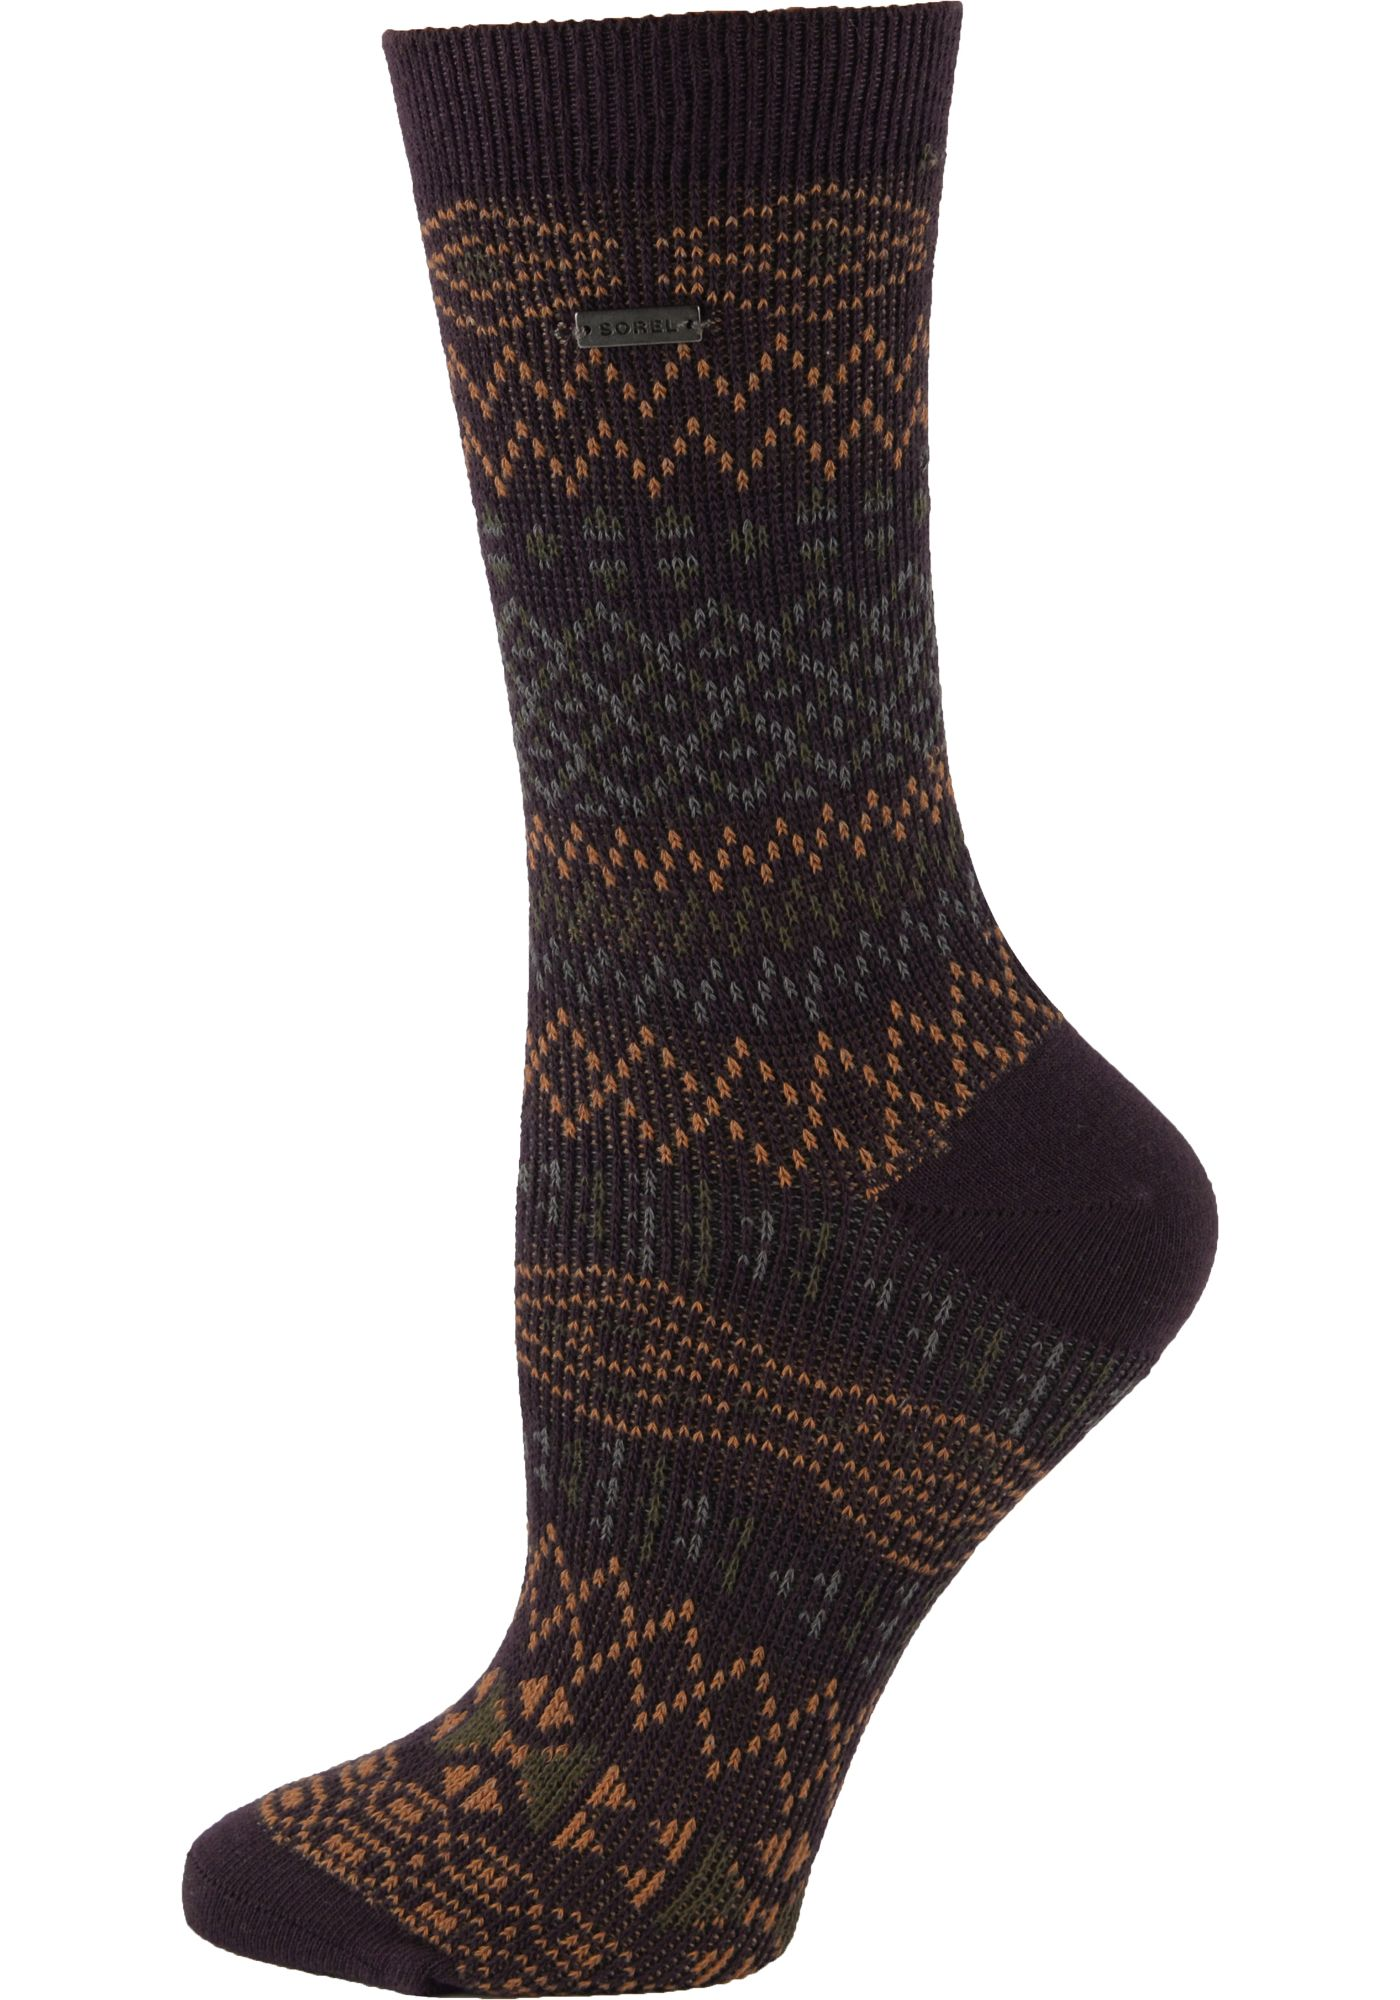 SOREL Women's Cotton Jacquard Pattern Crew Socks